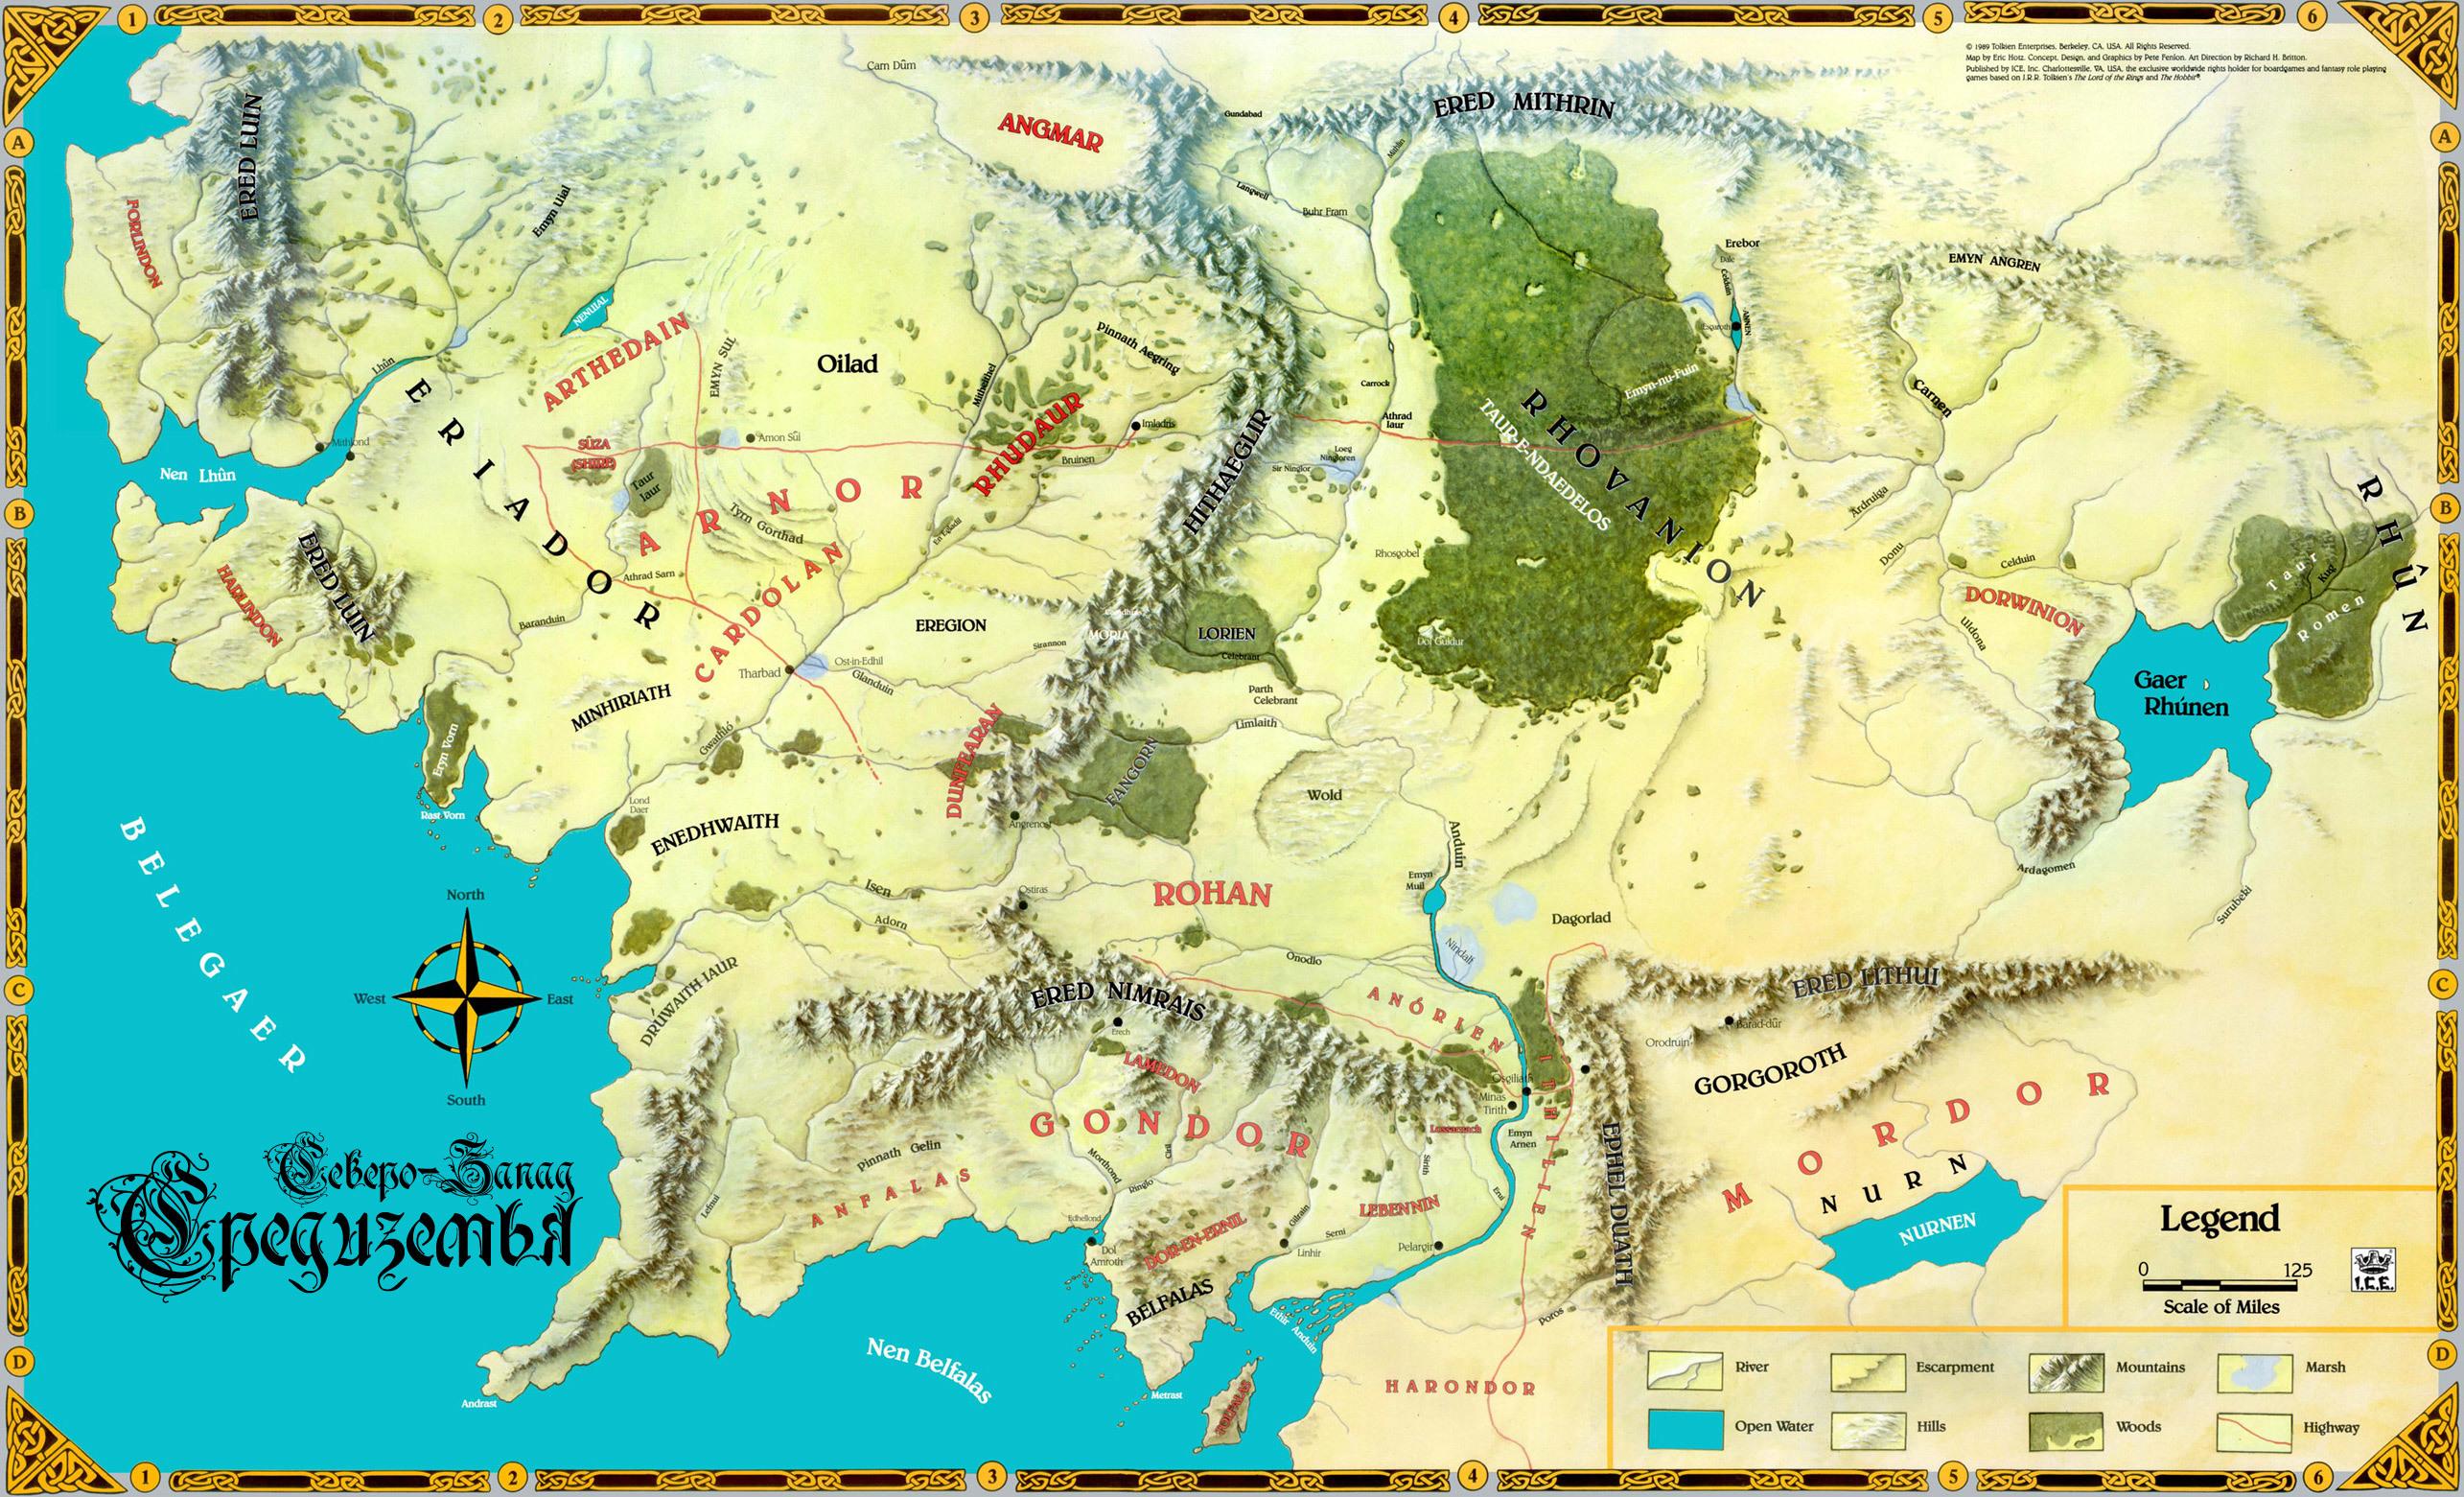 Karta Berkeley California.Download Wallpaper Map John R R Tolkien The Lord Of The Rings